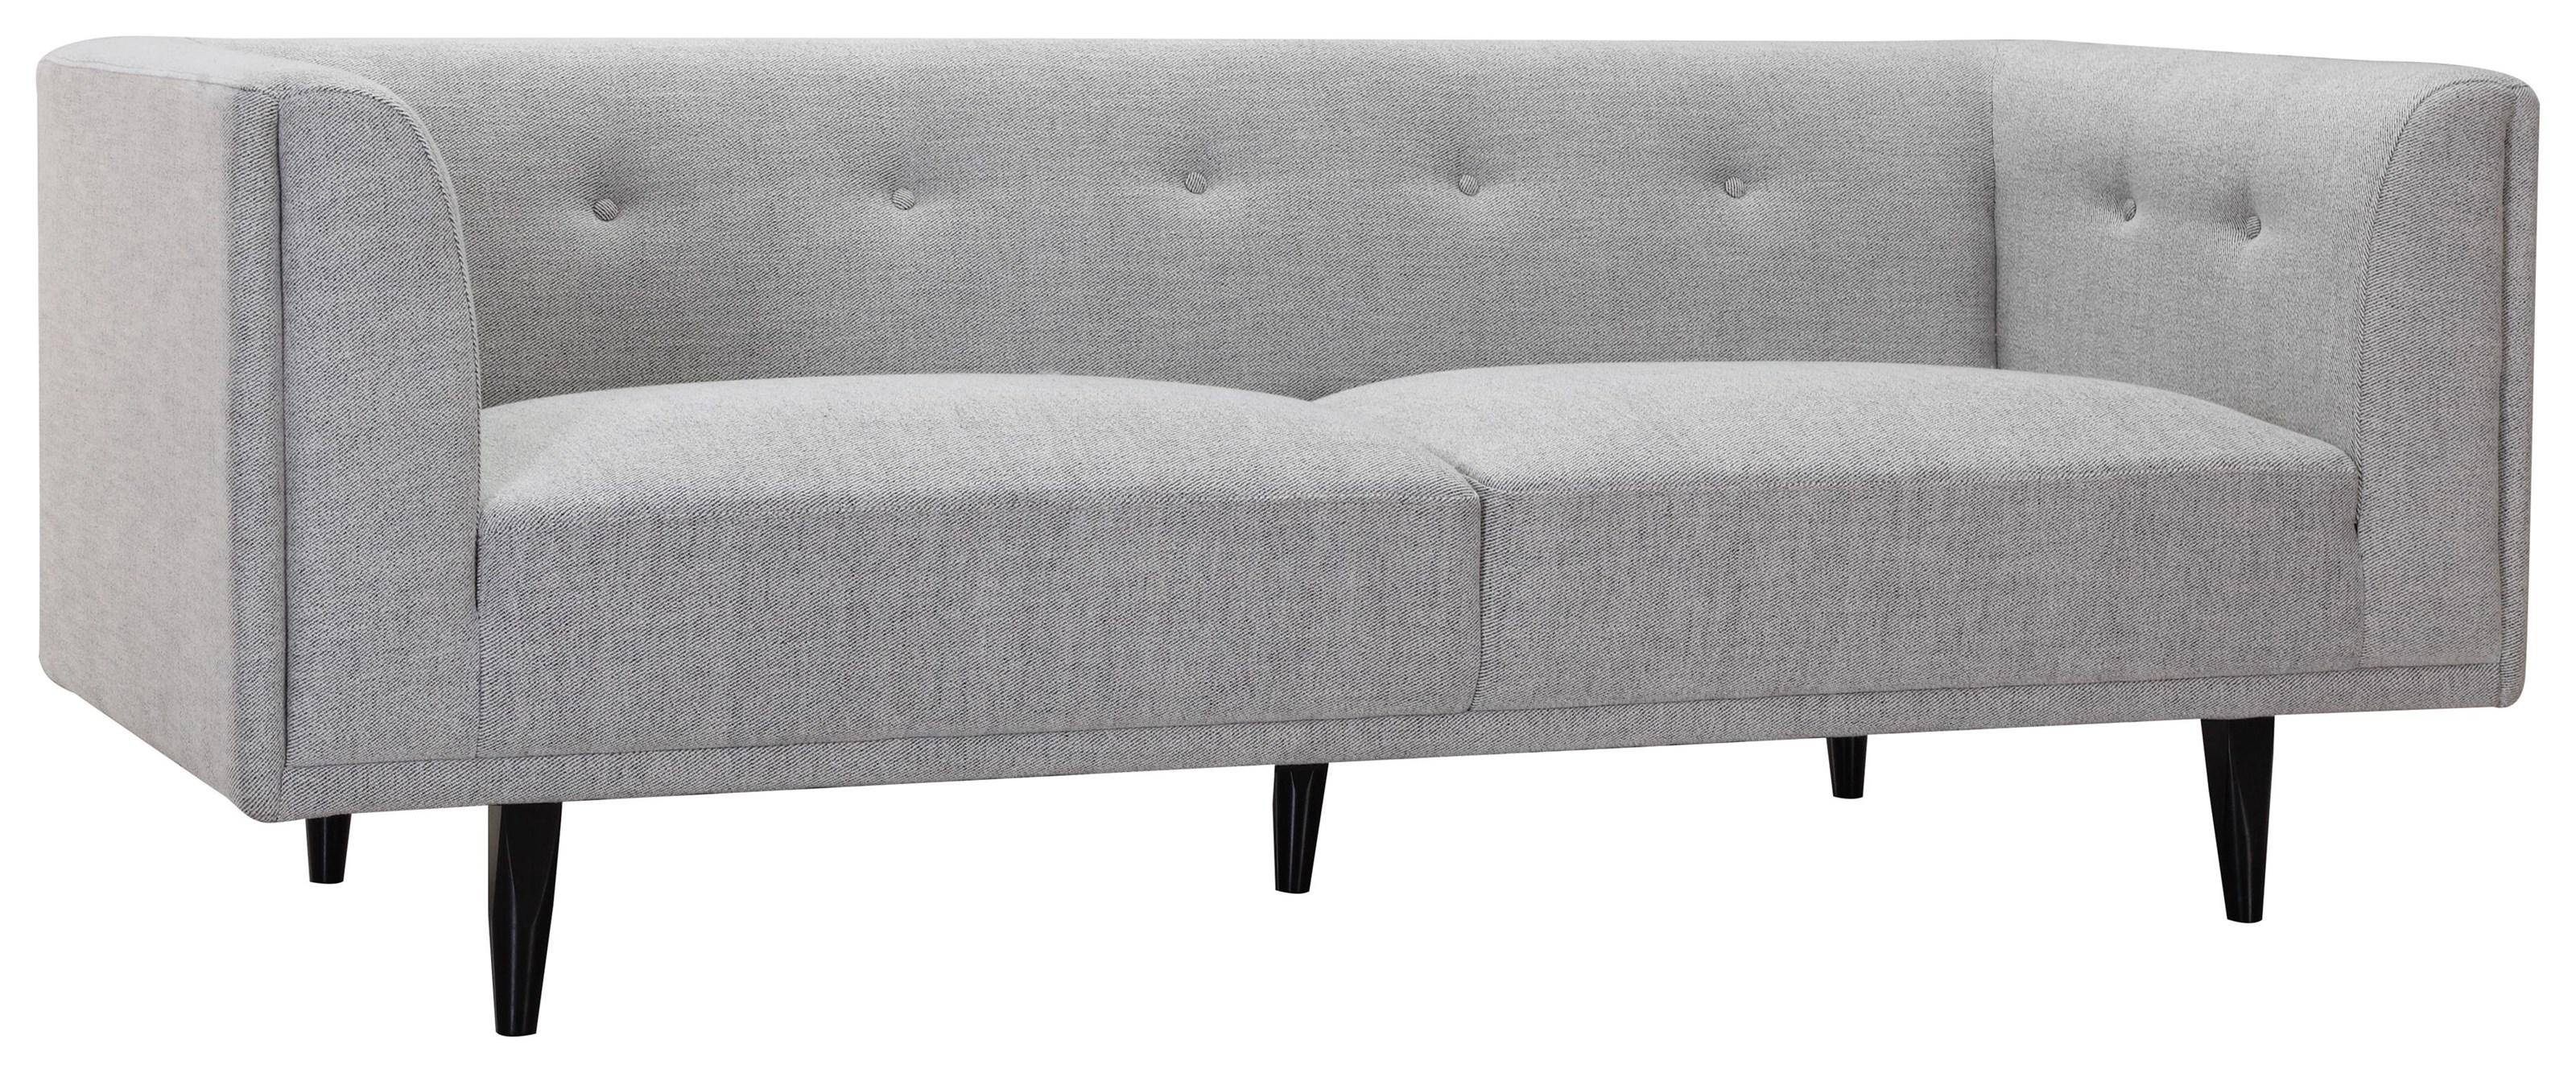 5093-03 Jake Sofa by Urban Chic at Stoney Creek Furniture